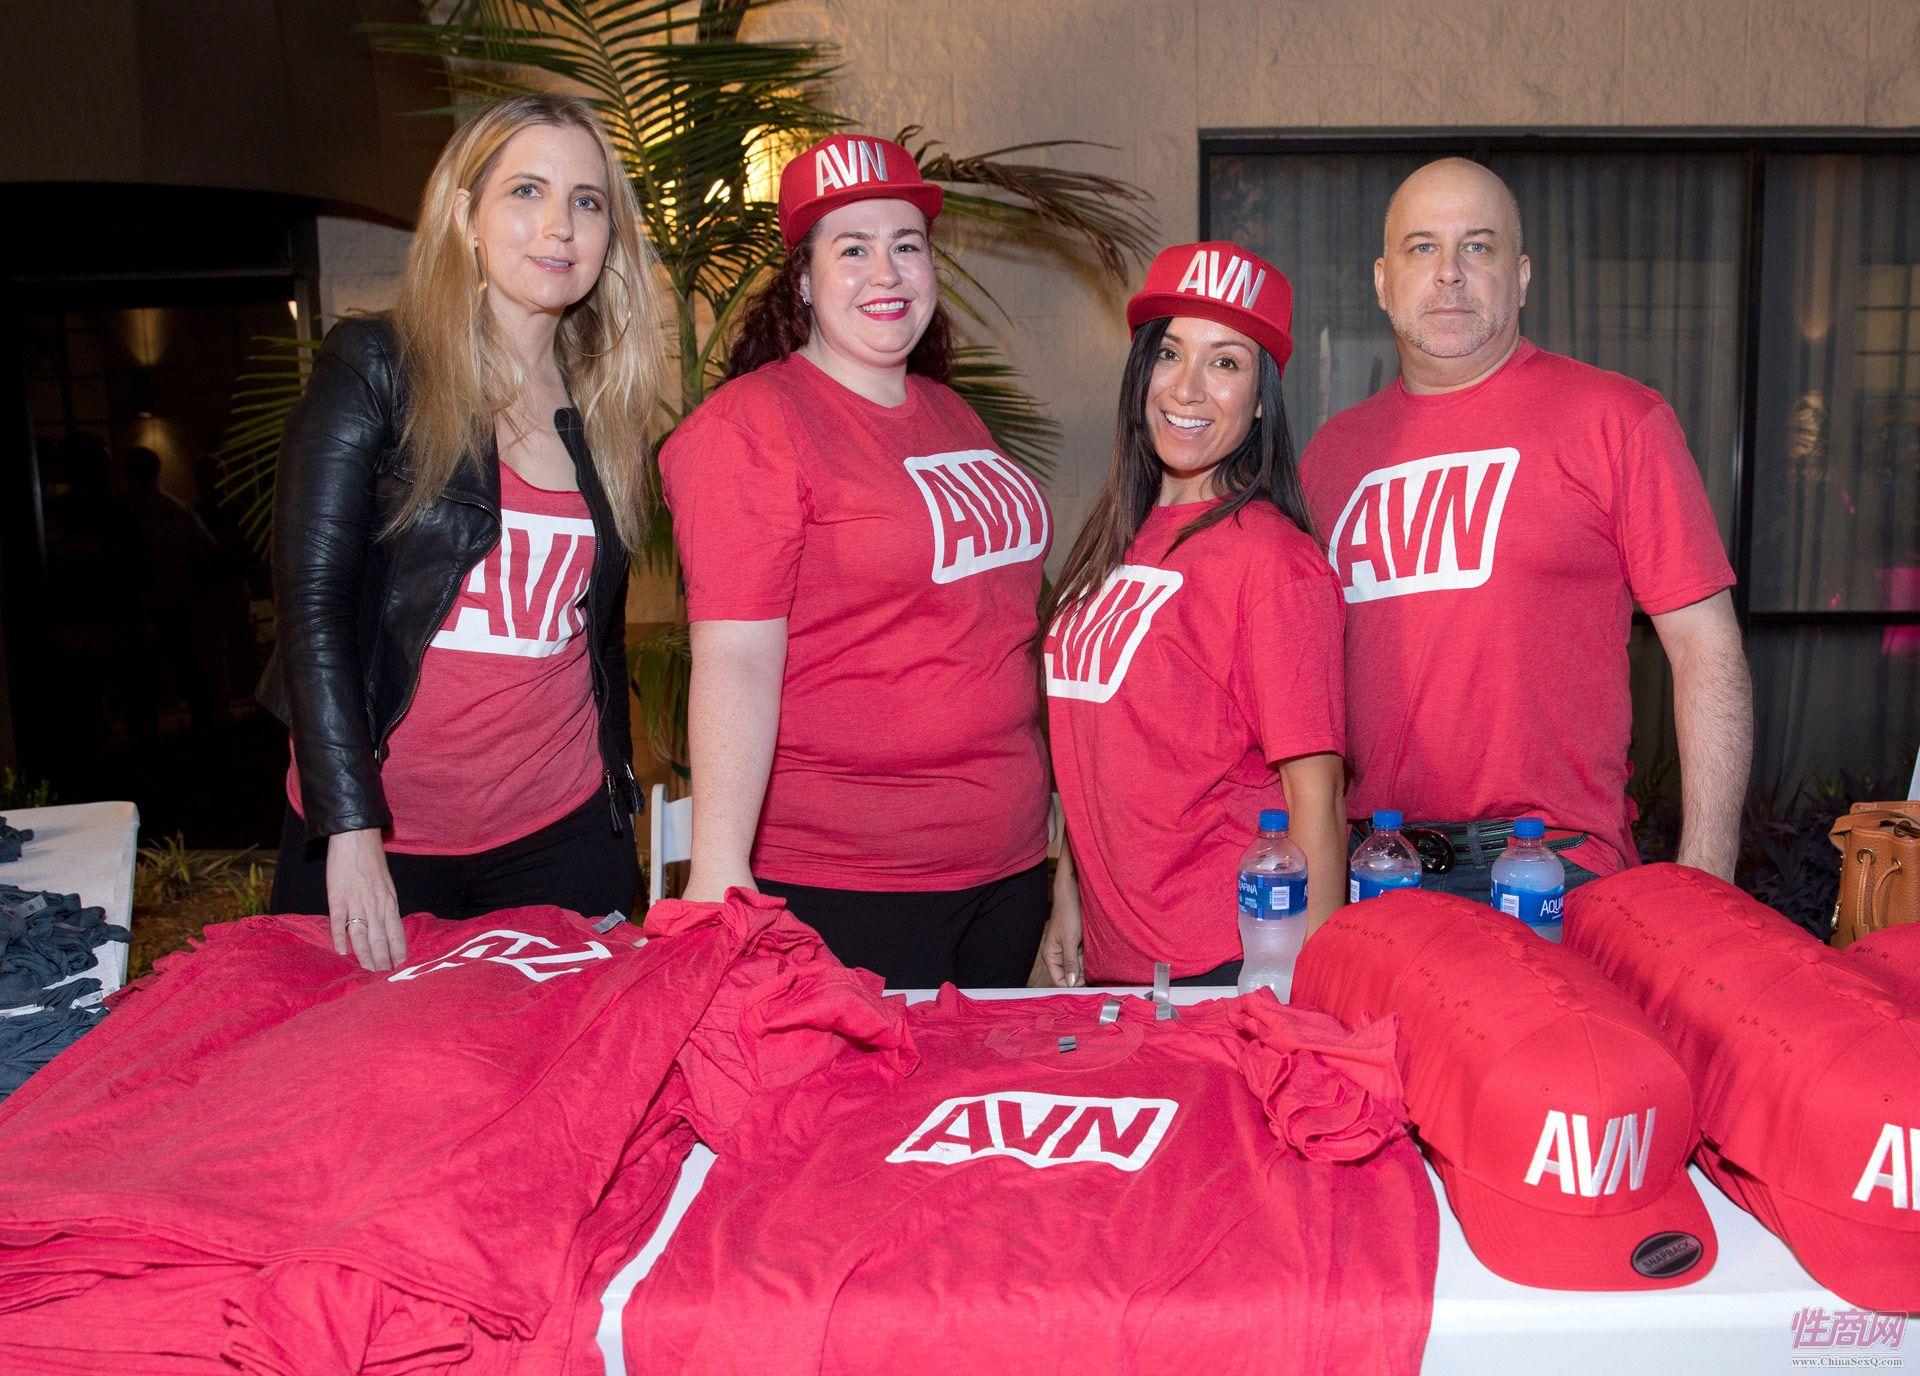 AVN工作人员赠送T恤和帽子